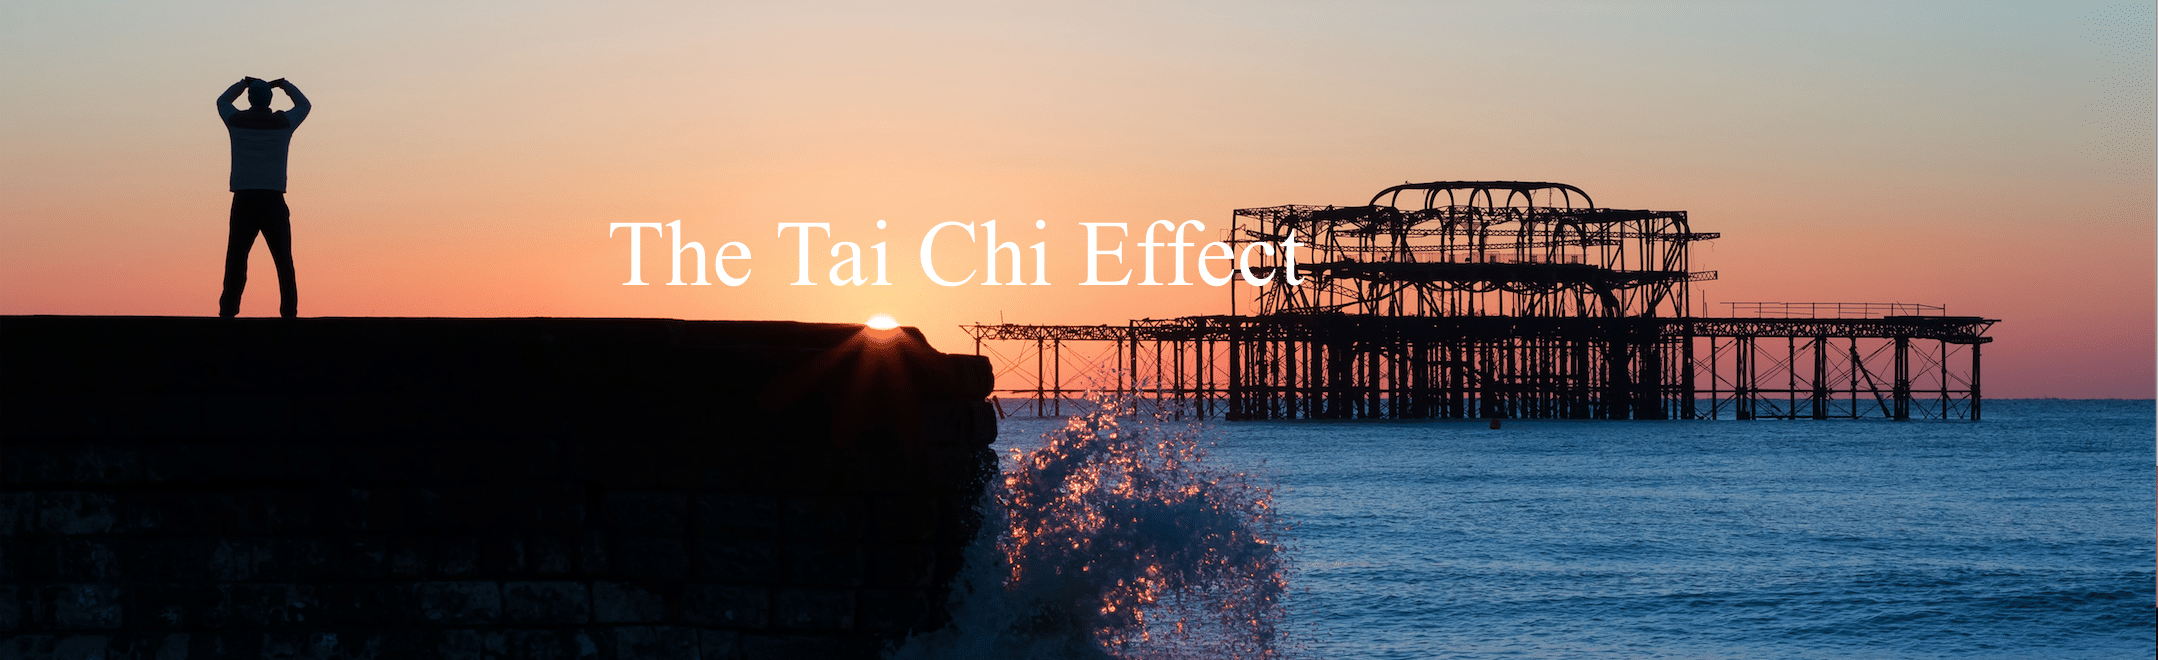 Tai Chi Effect